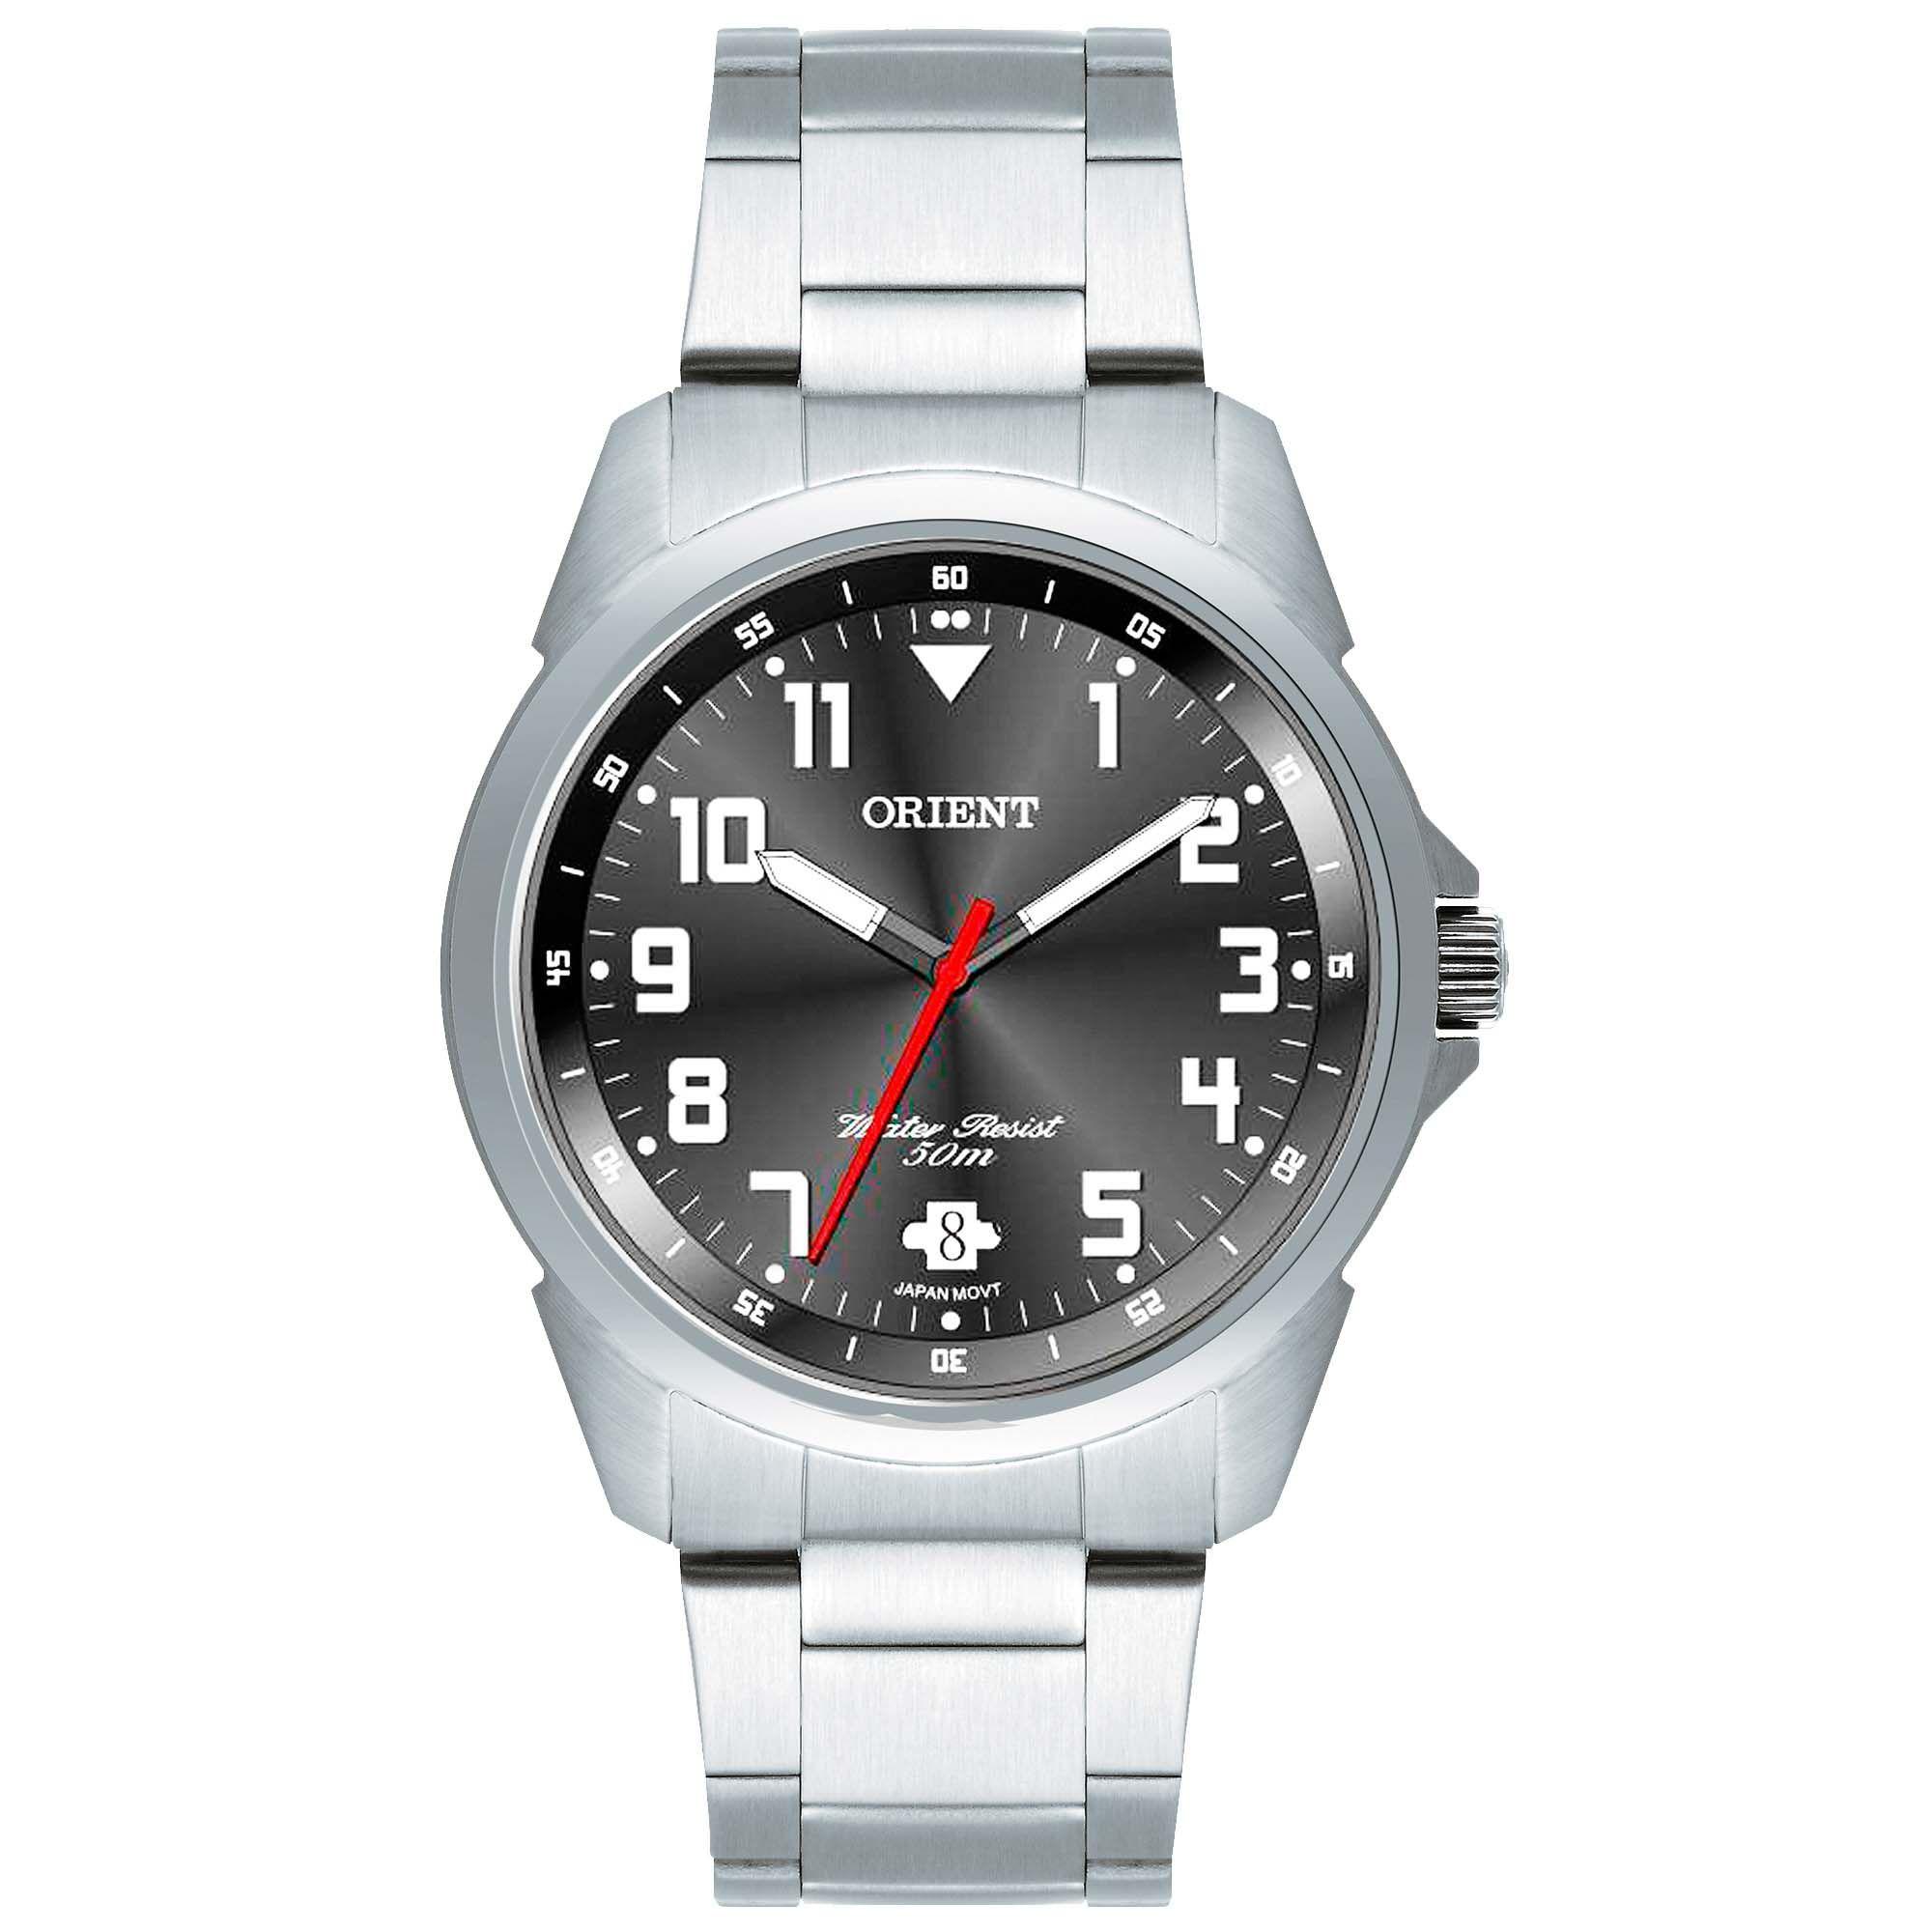 Relógio Masculino Orient MBSS1154 G2SX